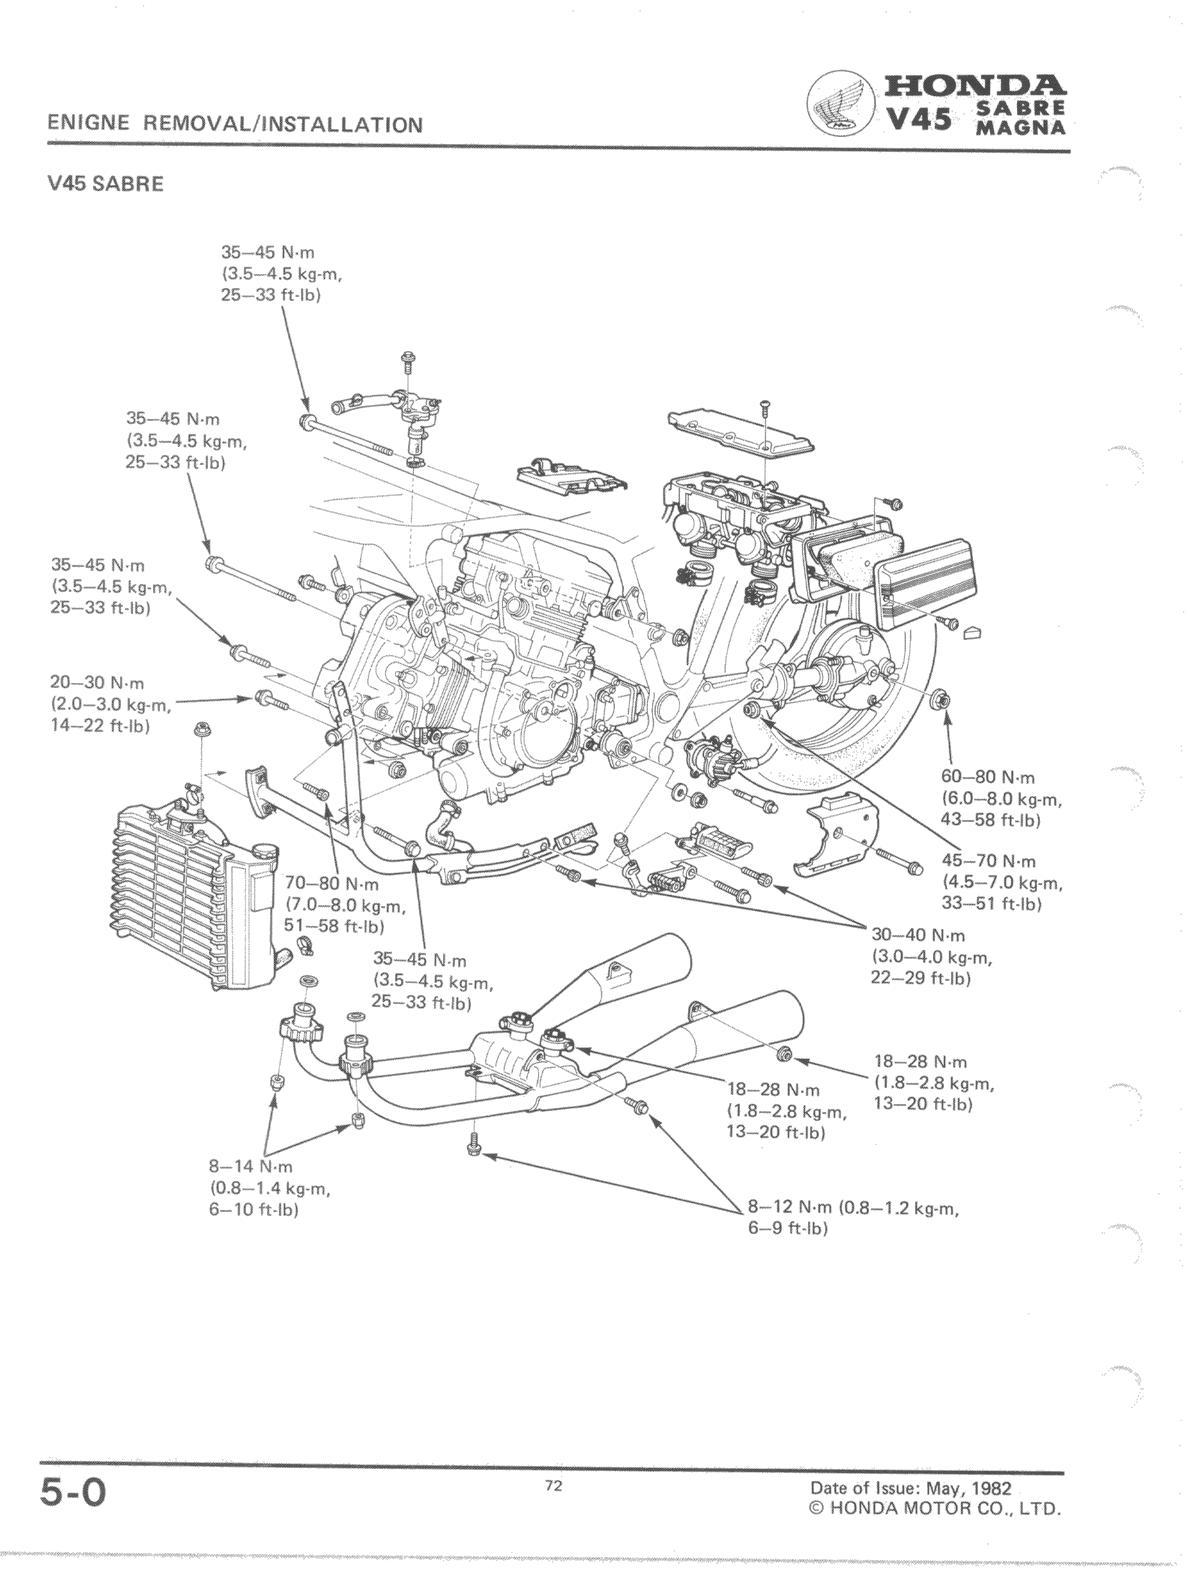 VF750C Shop Manual